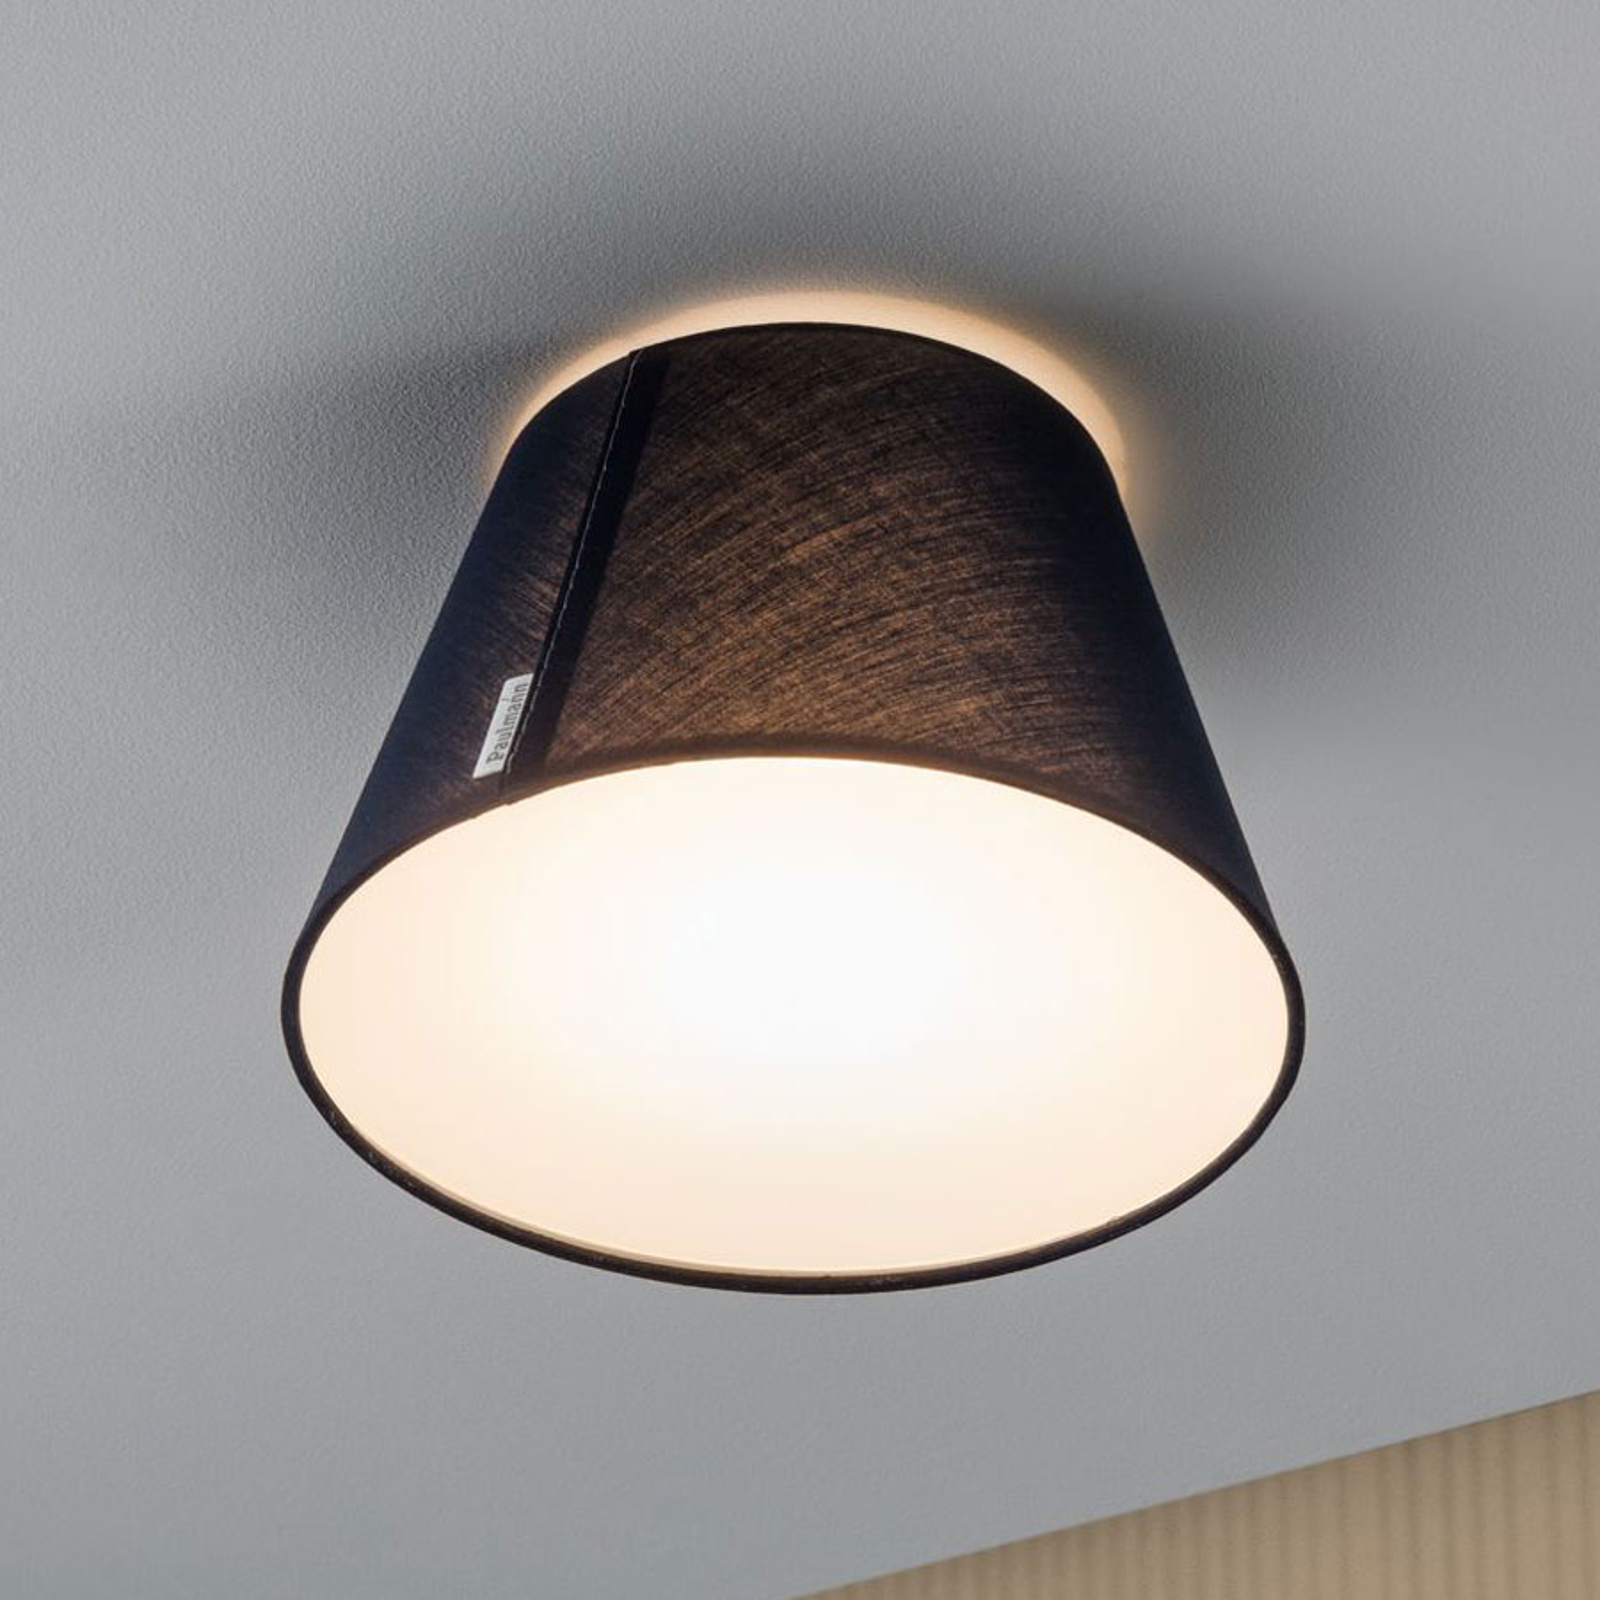 Paulmann Mea plafondlamp, blauw